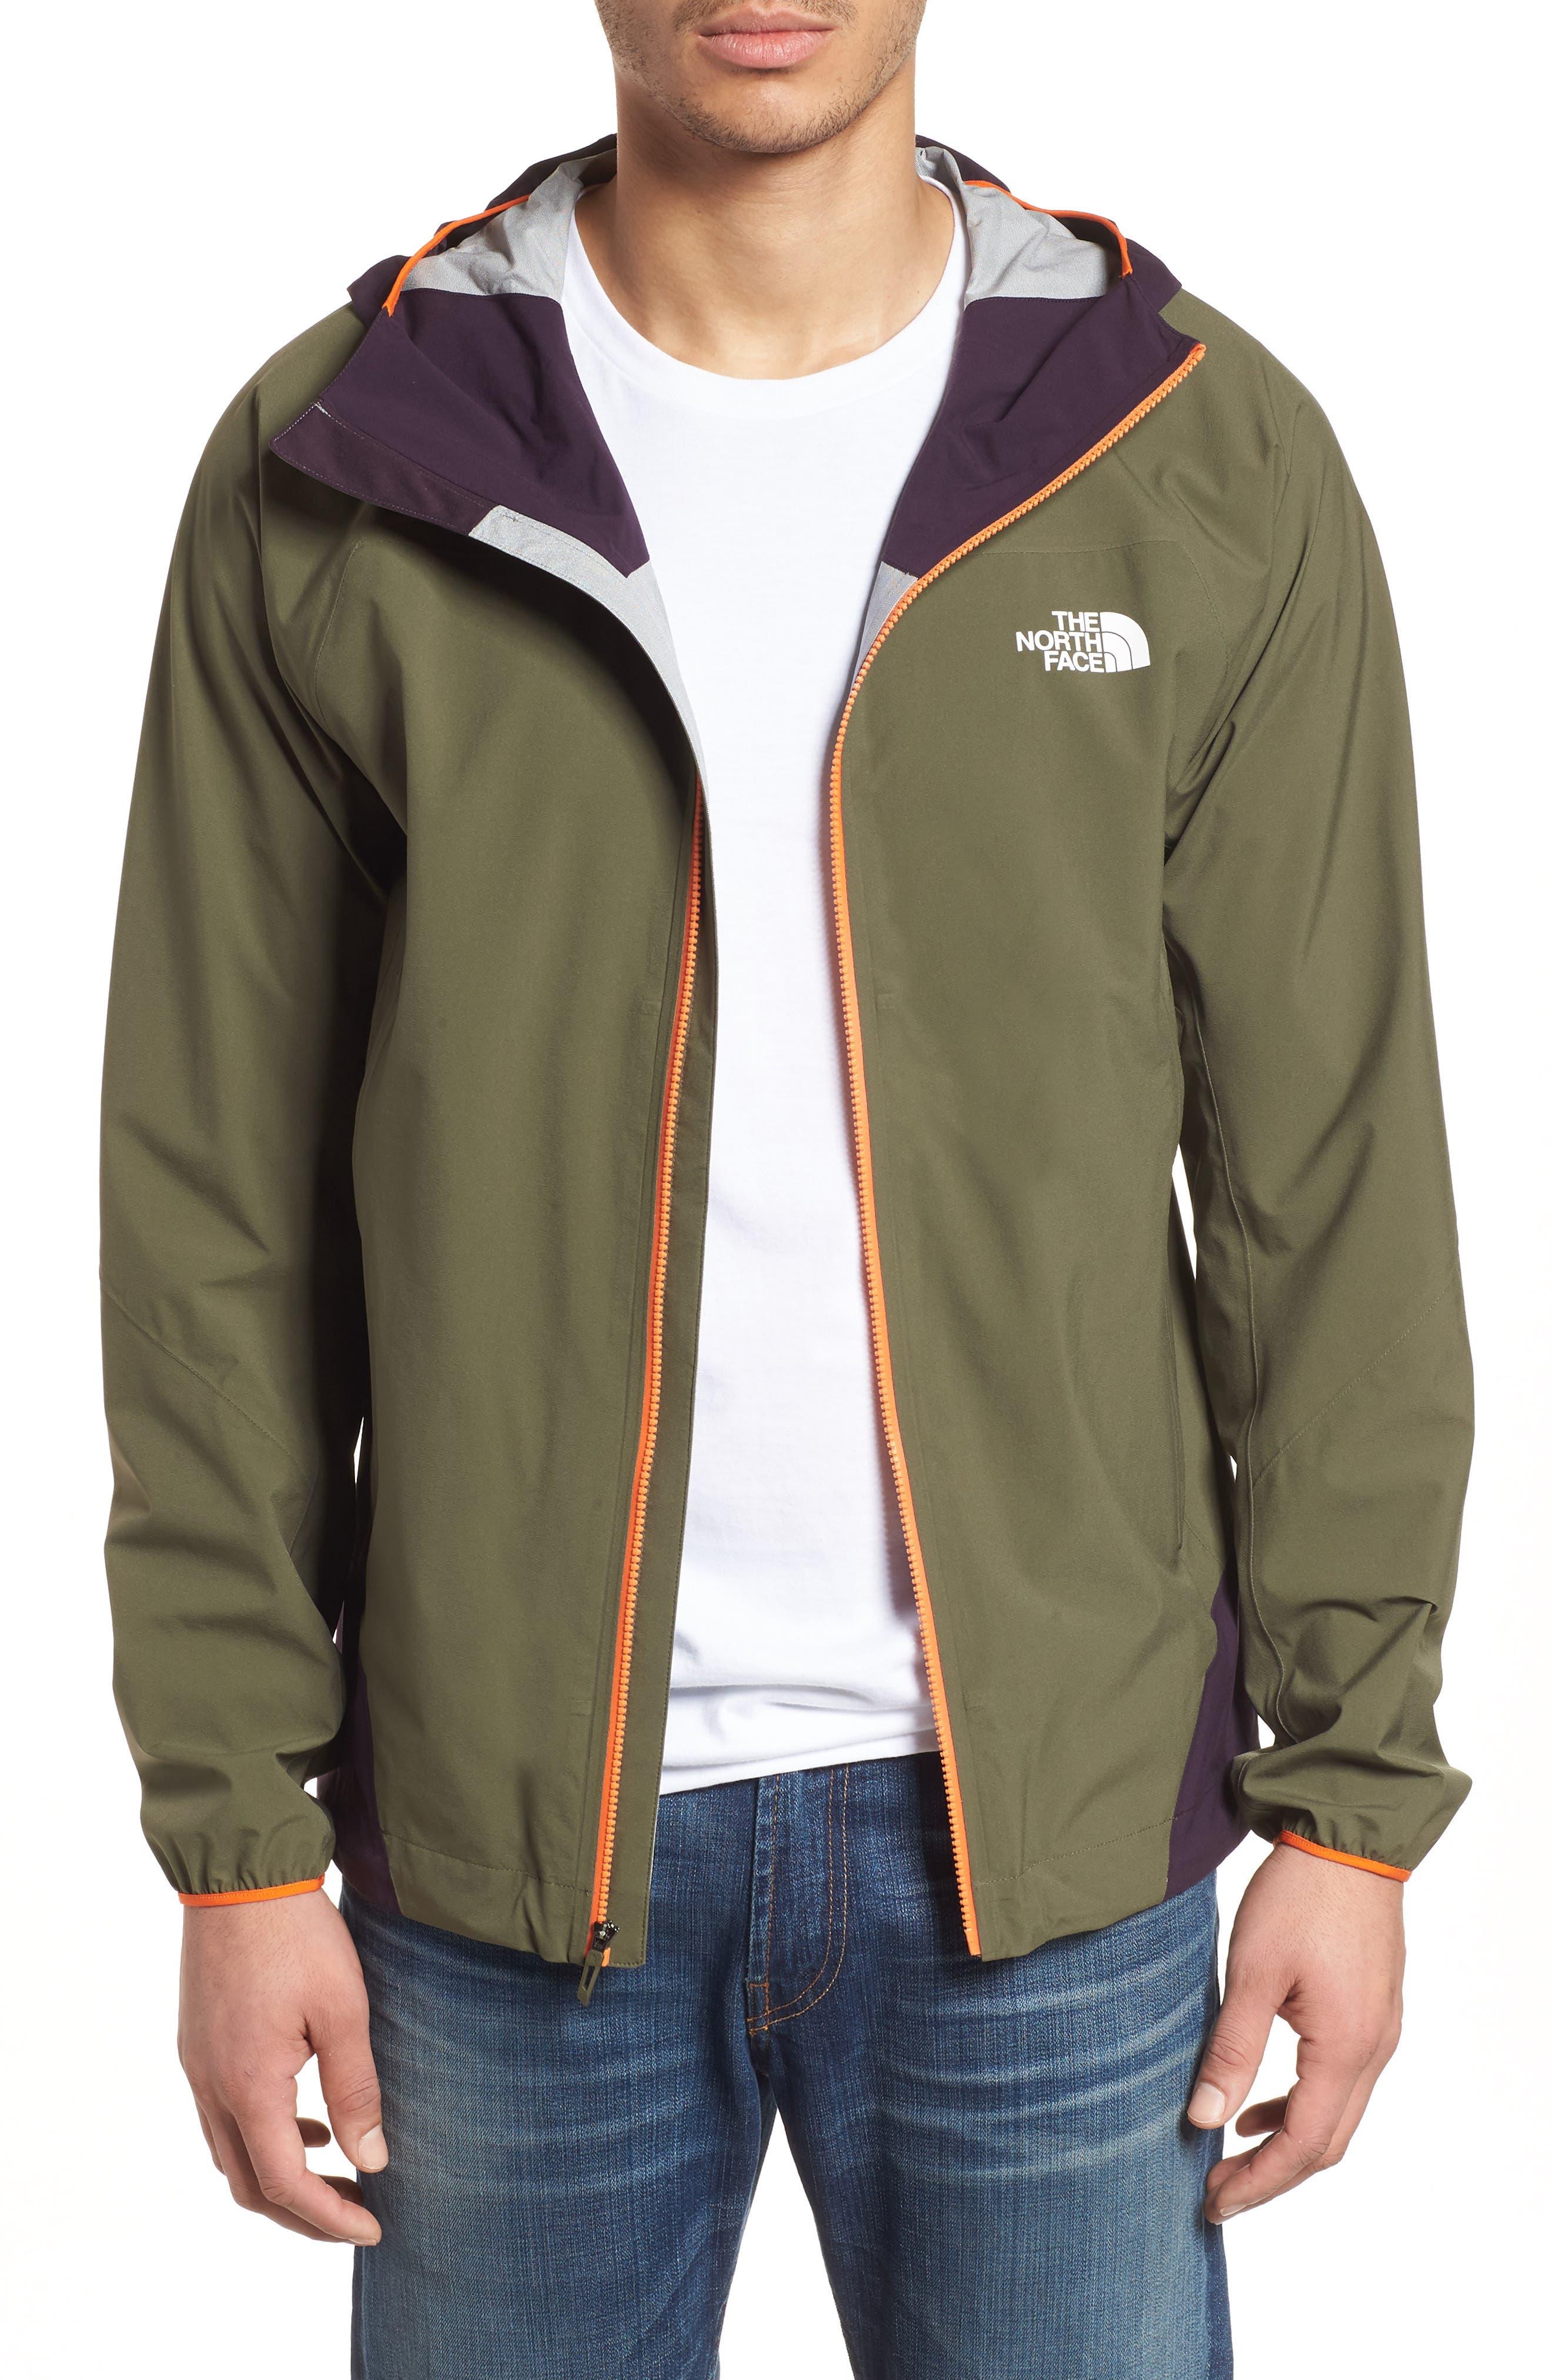 The North Face Progressor Jacket